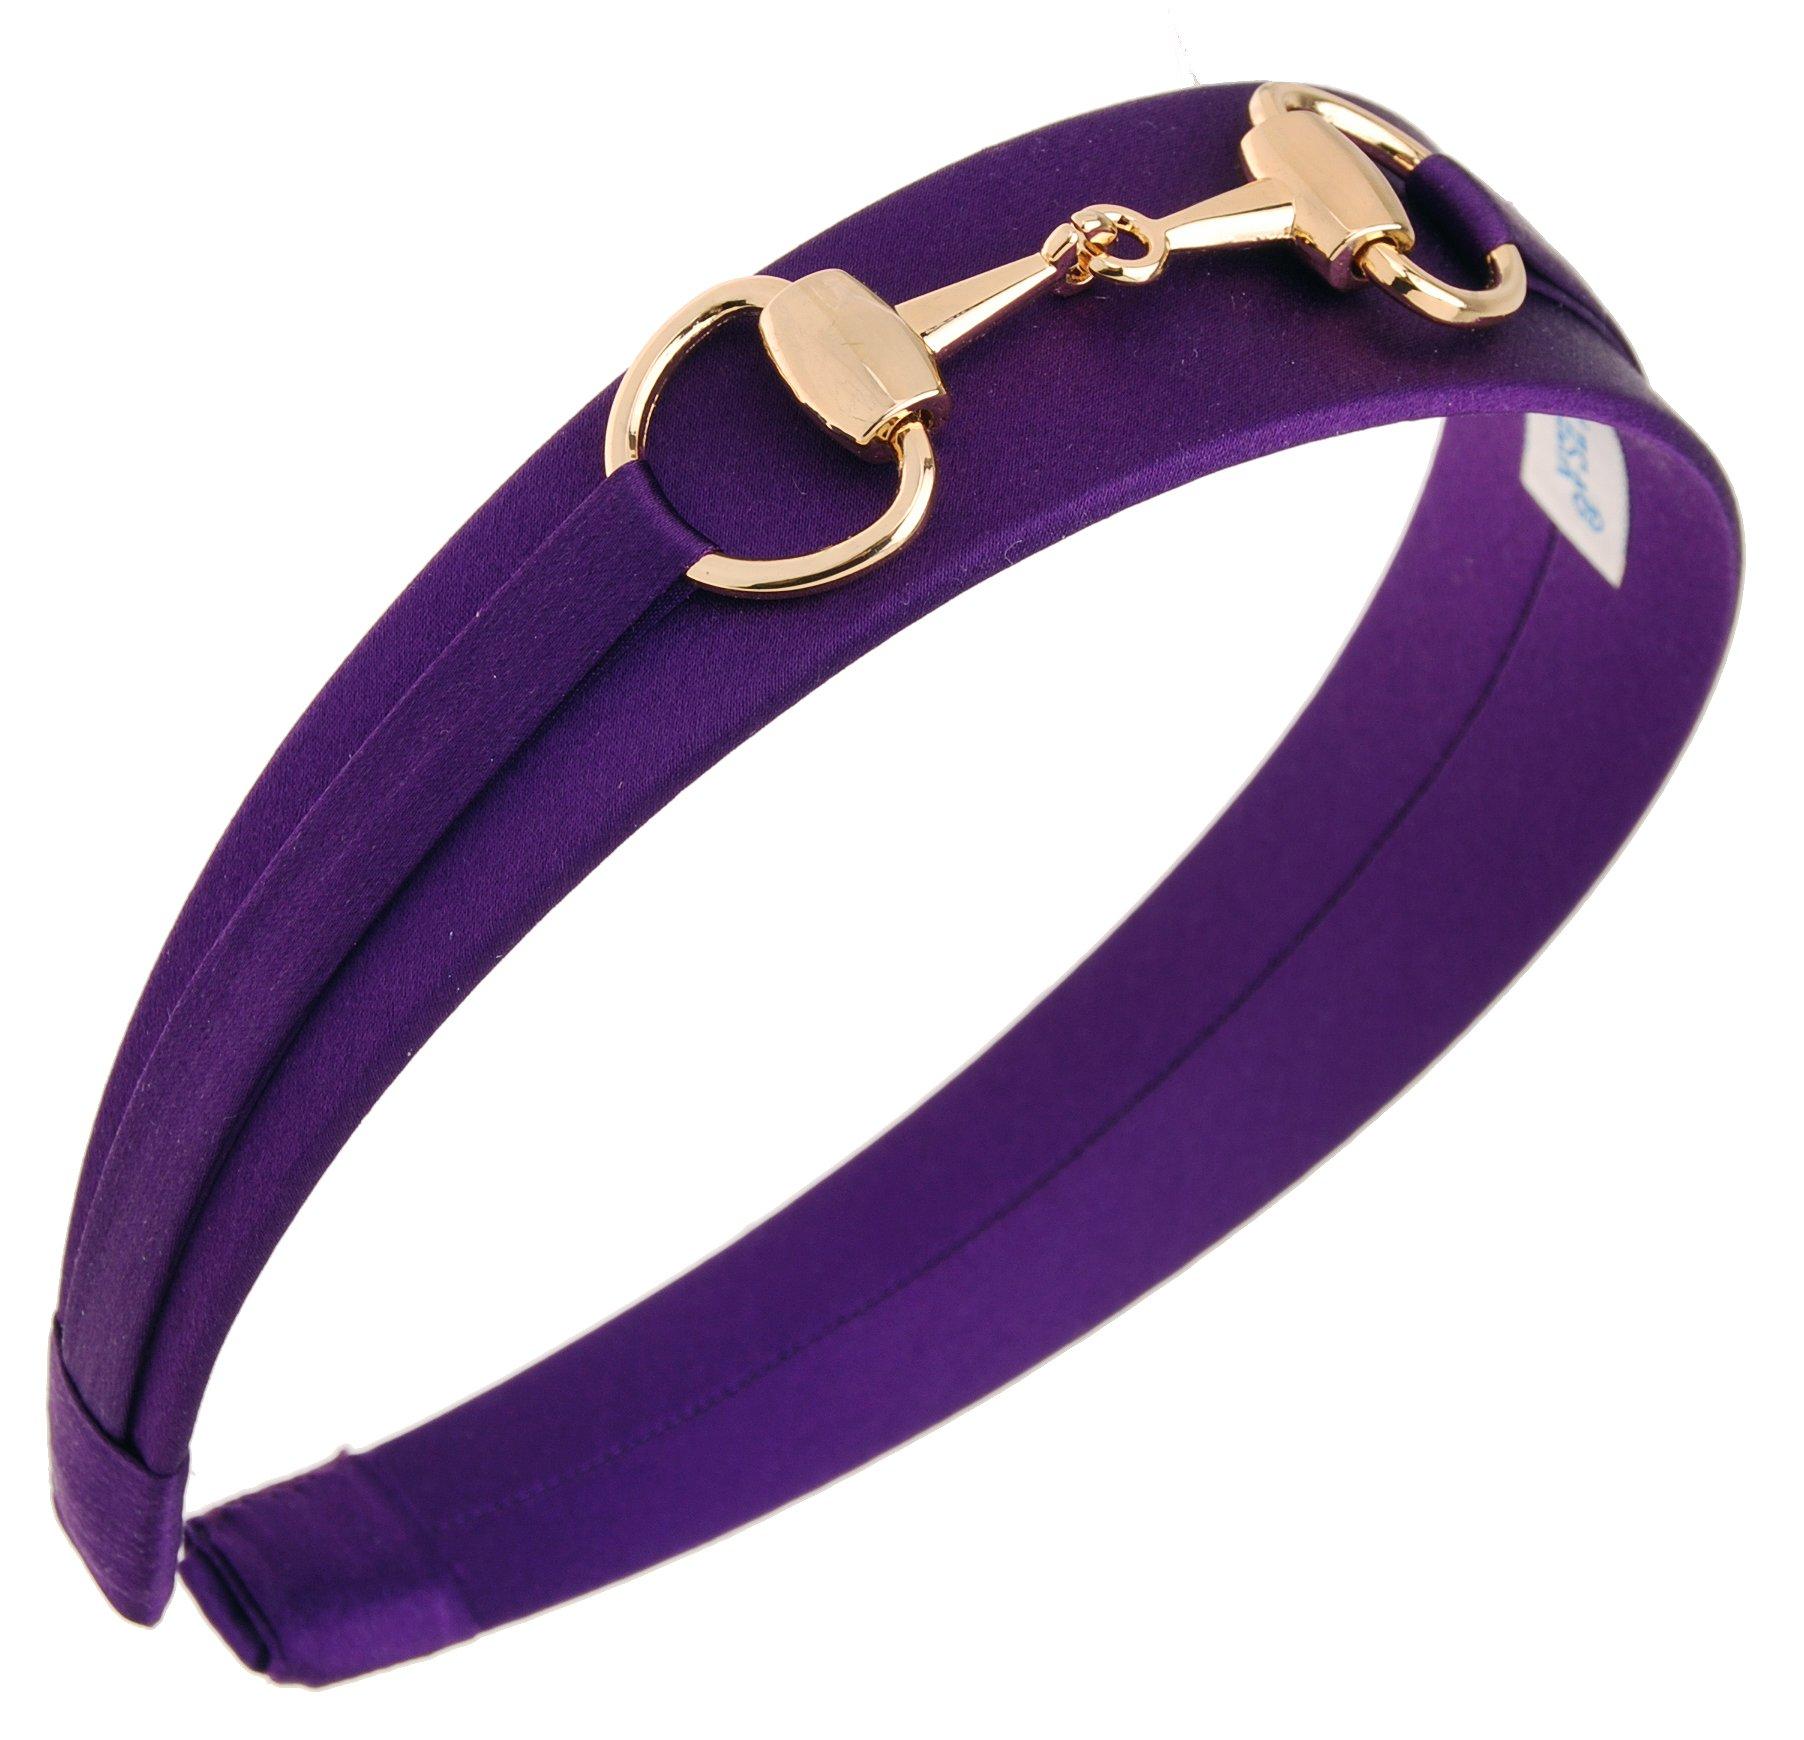 L. Erickson USA Bit Headband - Silk Charmeuse Purple Mink